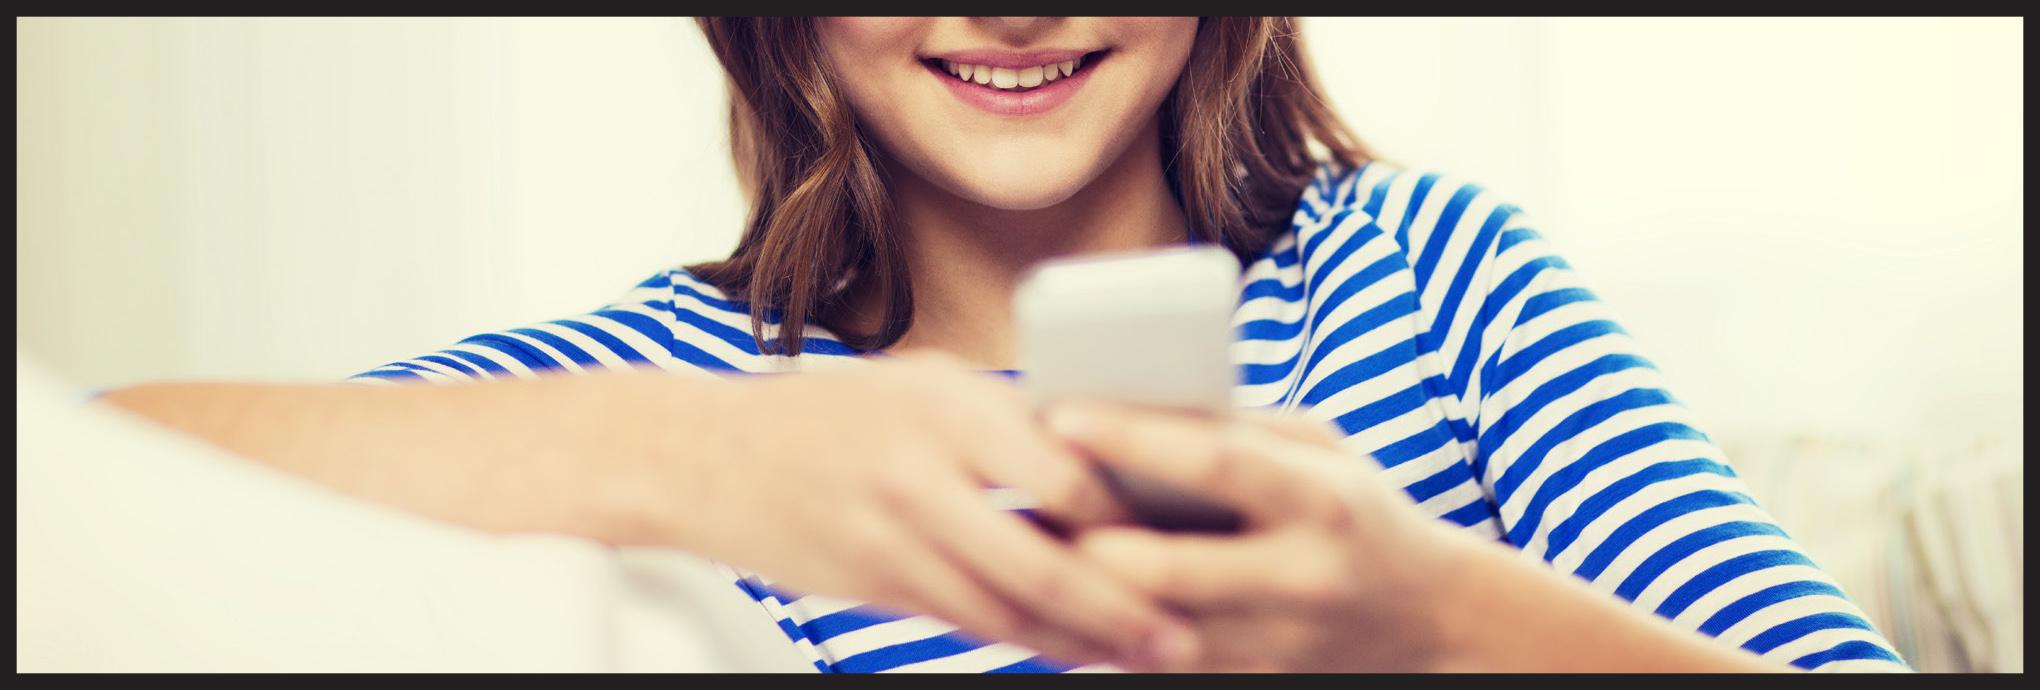 mobile-media-marketing